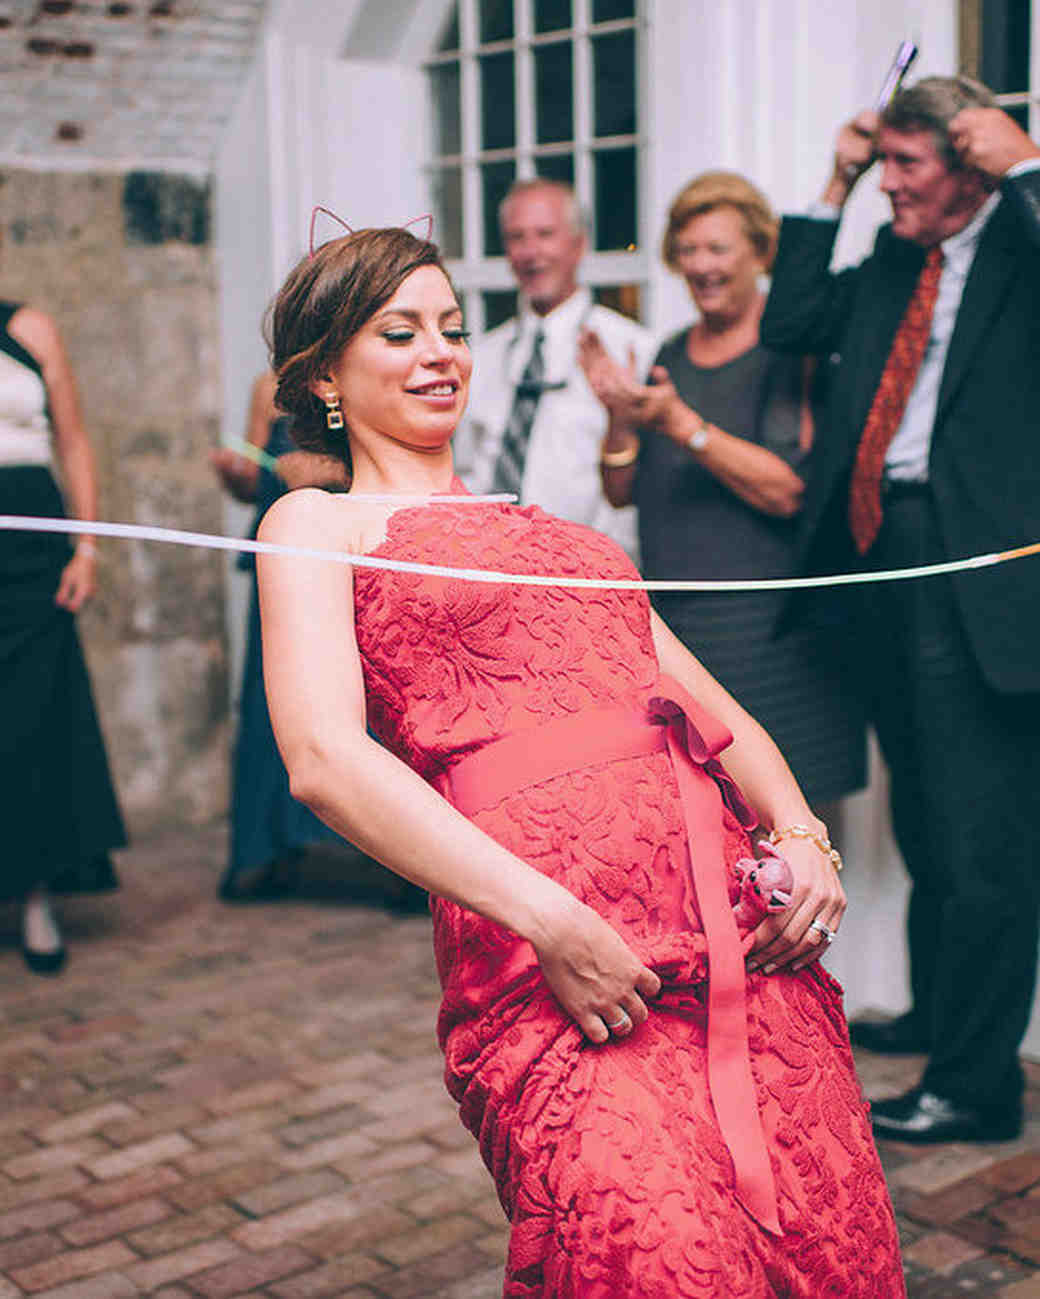 wedding guest limbo